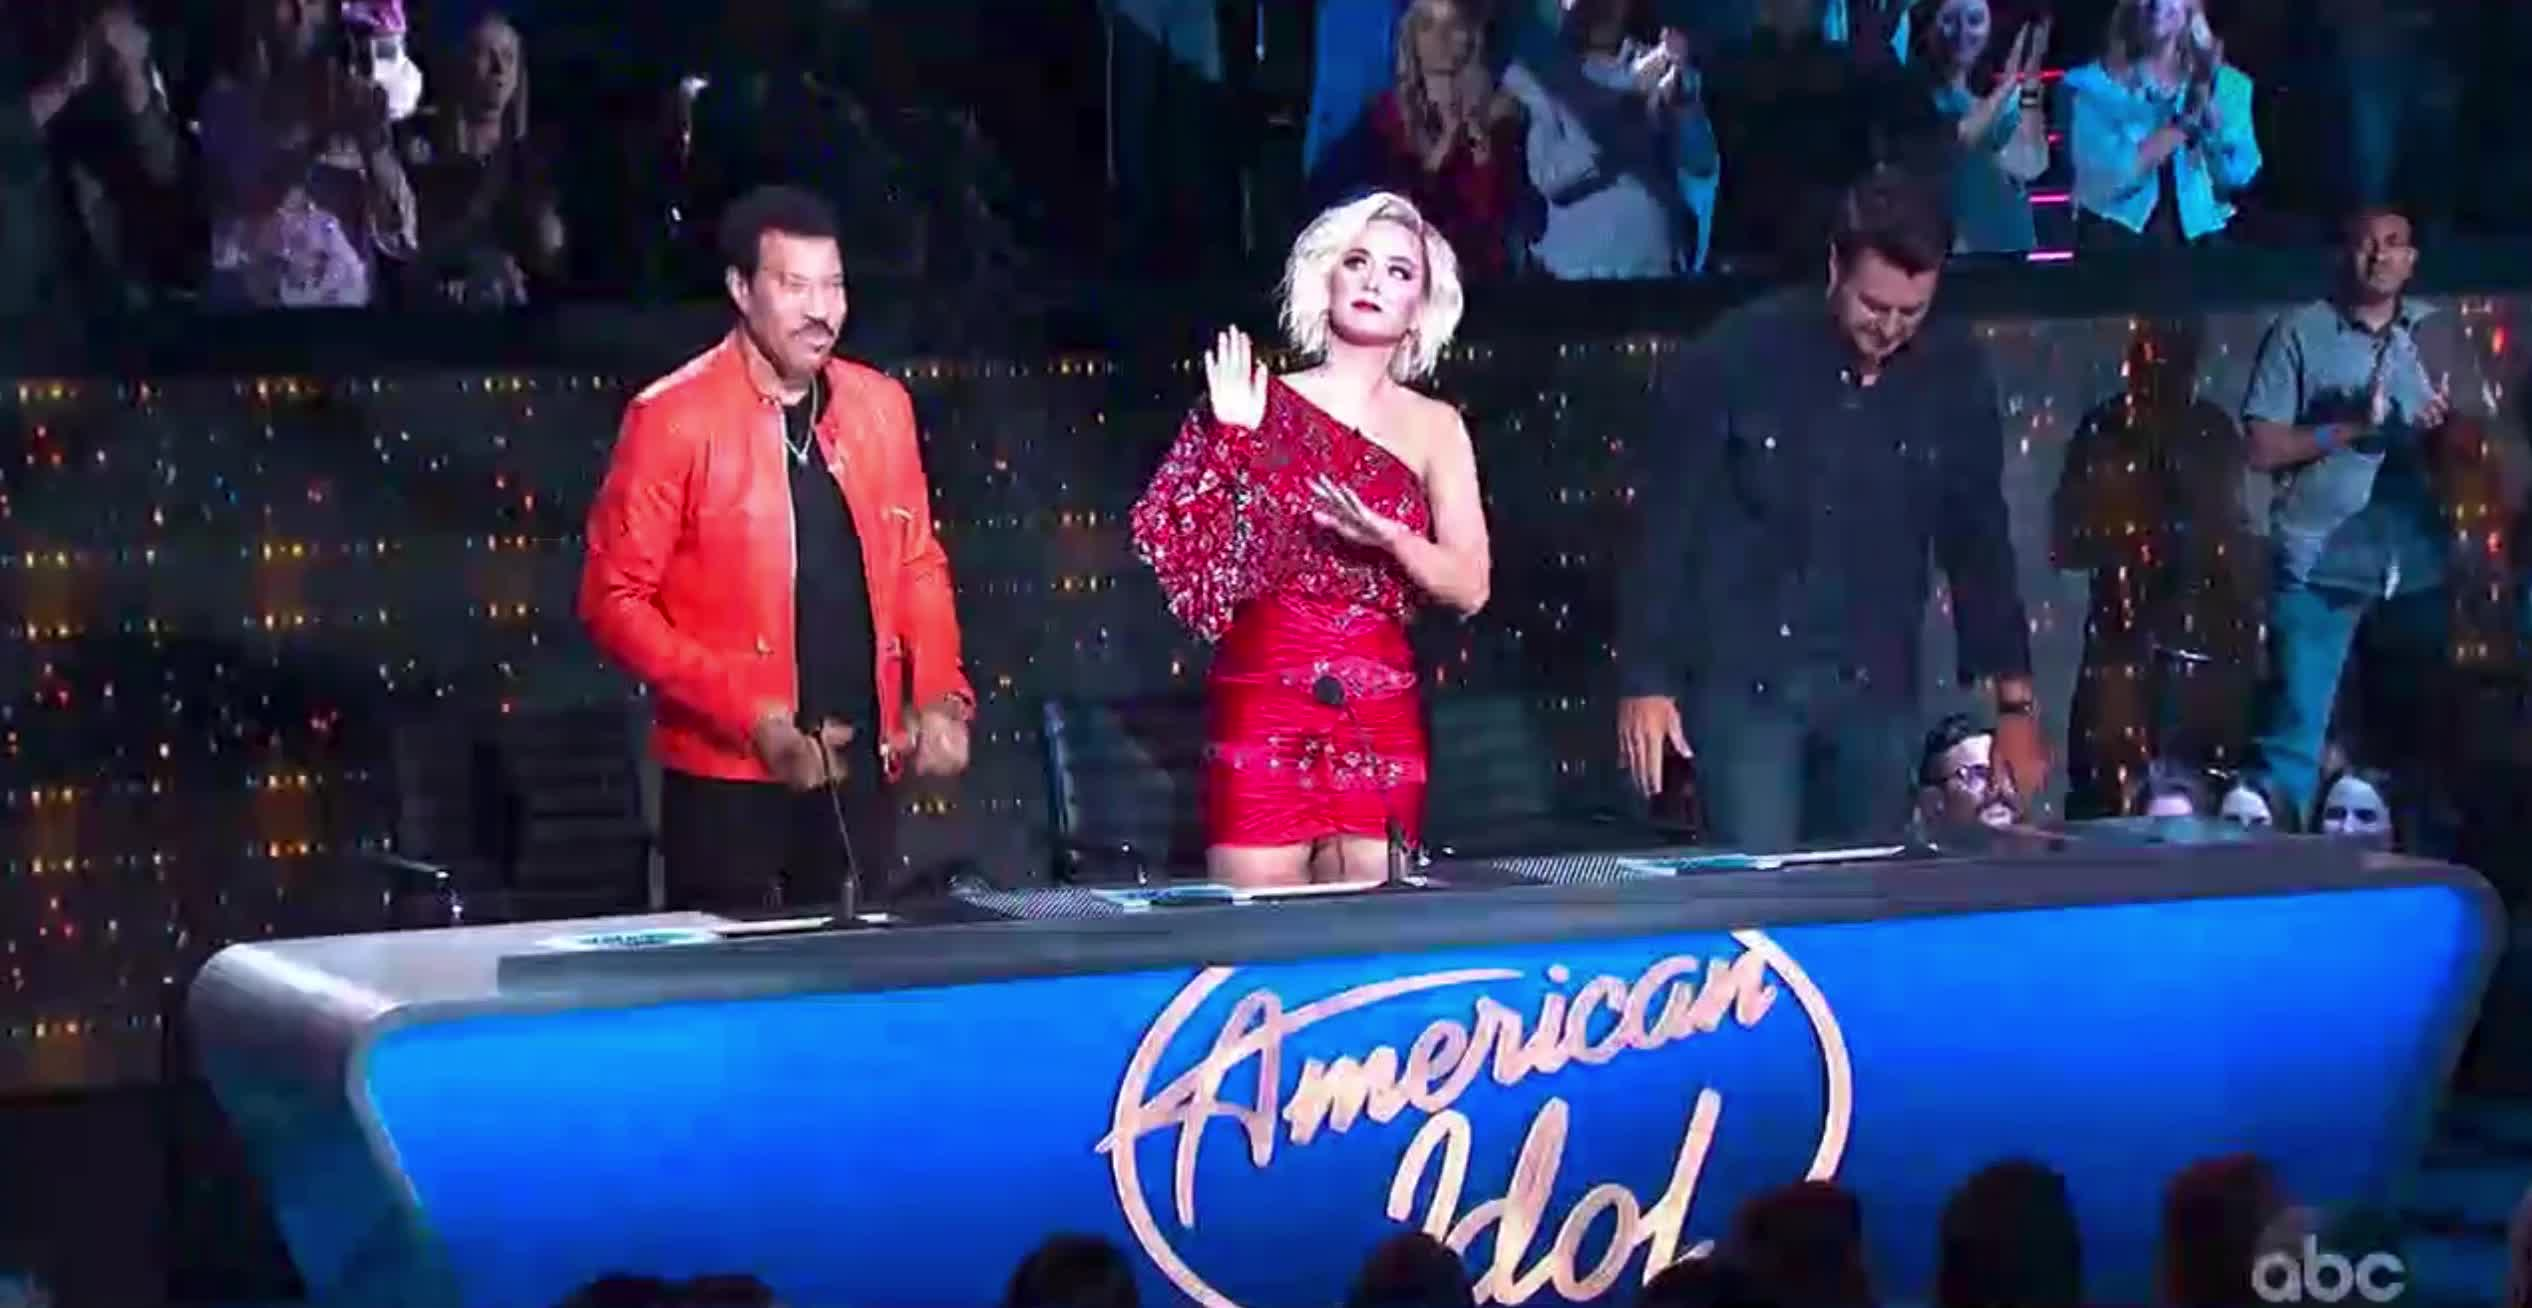 american idol, american idol season 17, americanidol, celebrities, celebrity, celebs, katy perry, lionel richie, luke bryan, ryan seacrest, season 17, American Idol The Judges GIFs